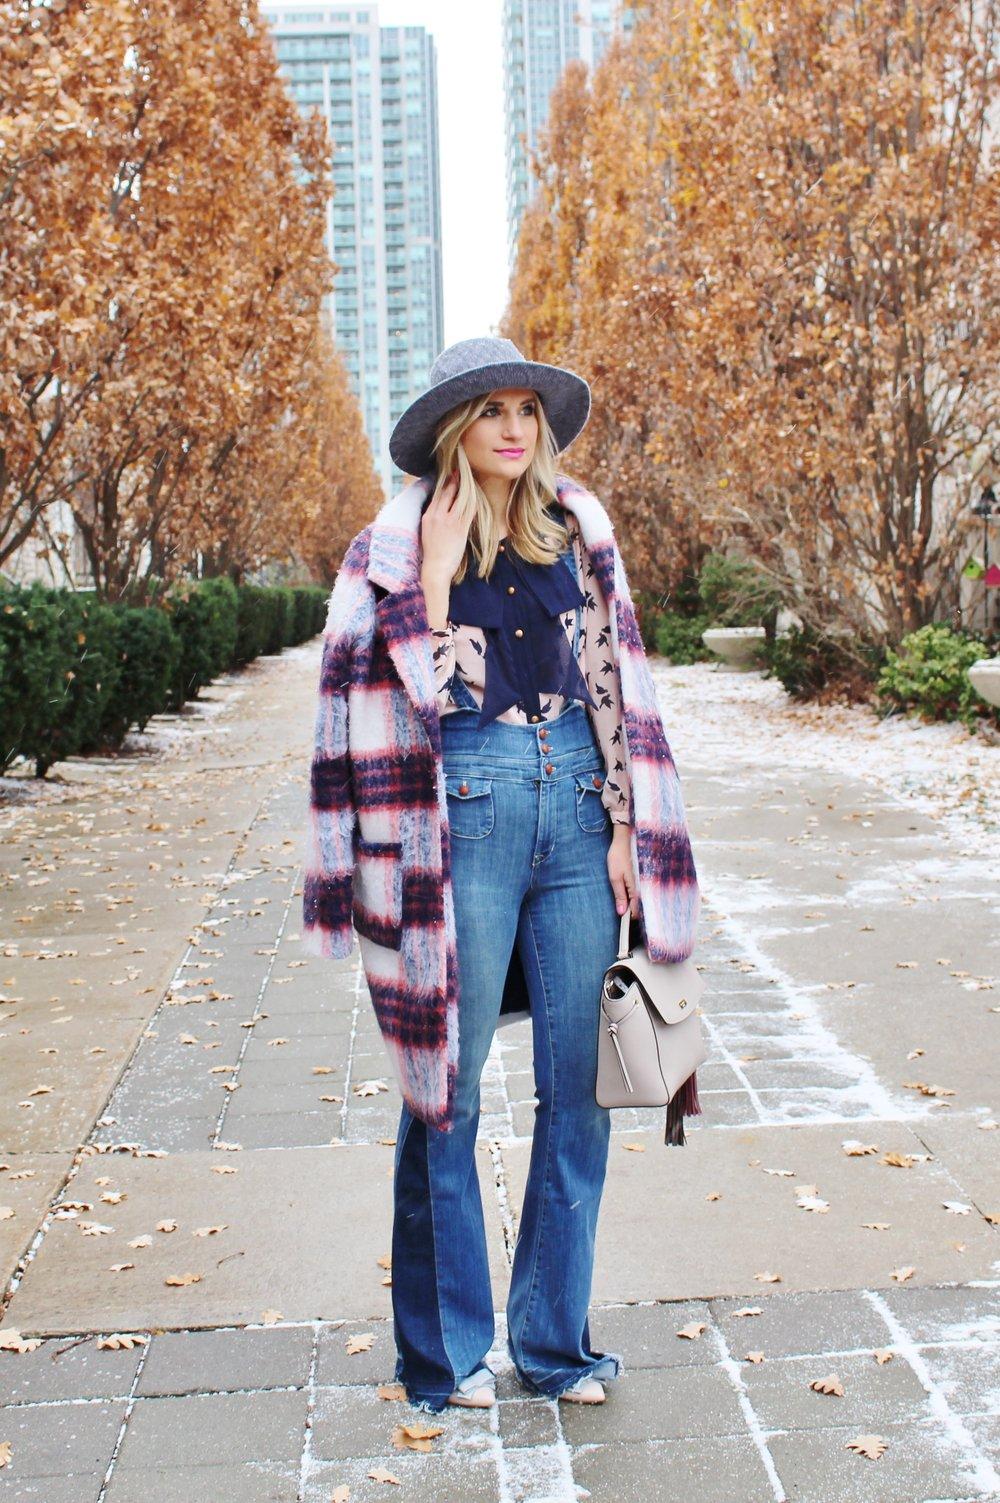 bijuleni-fidelity-jeans-boho-style-plaid-wool-coat.JPG